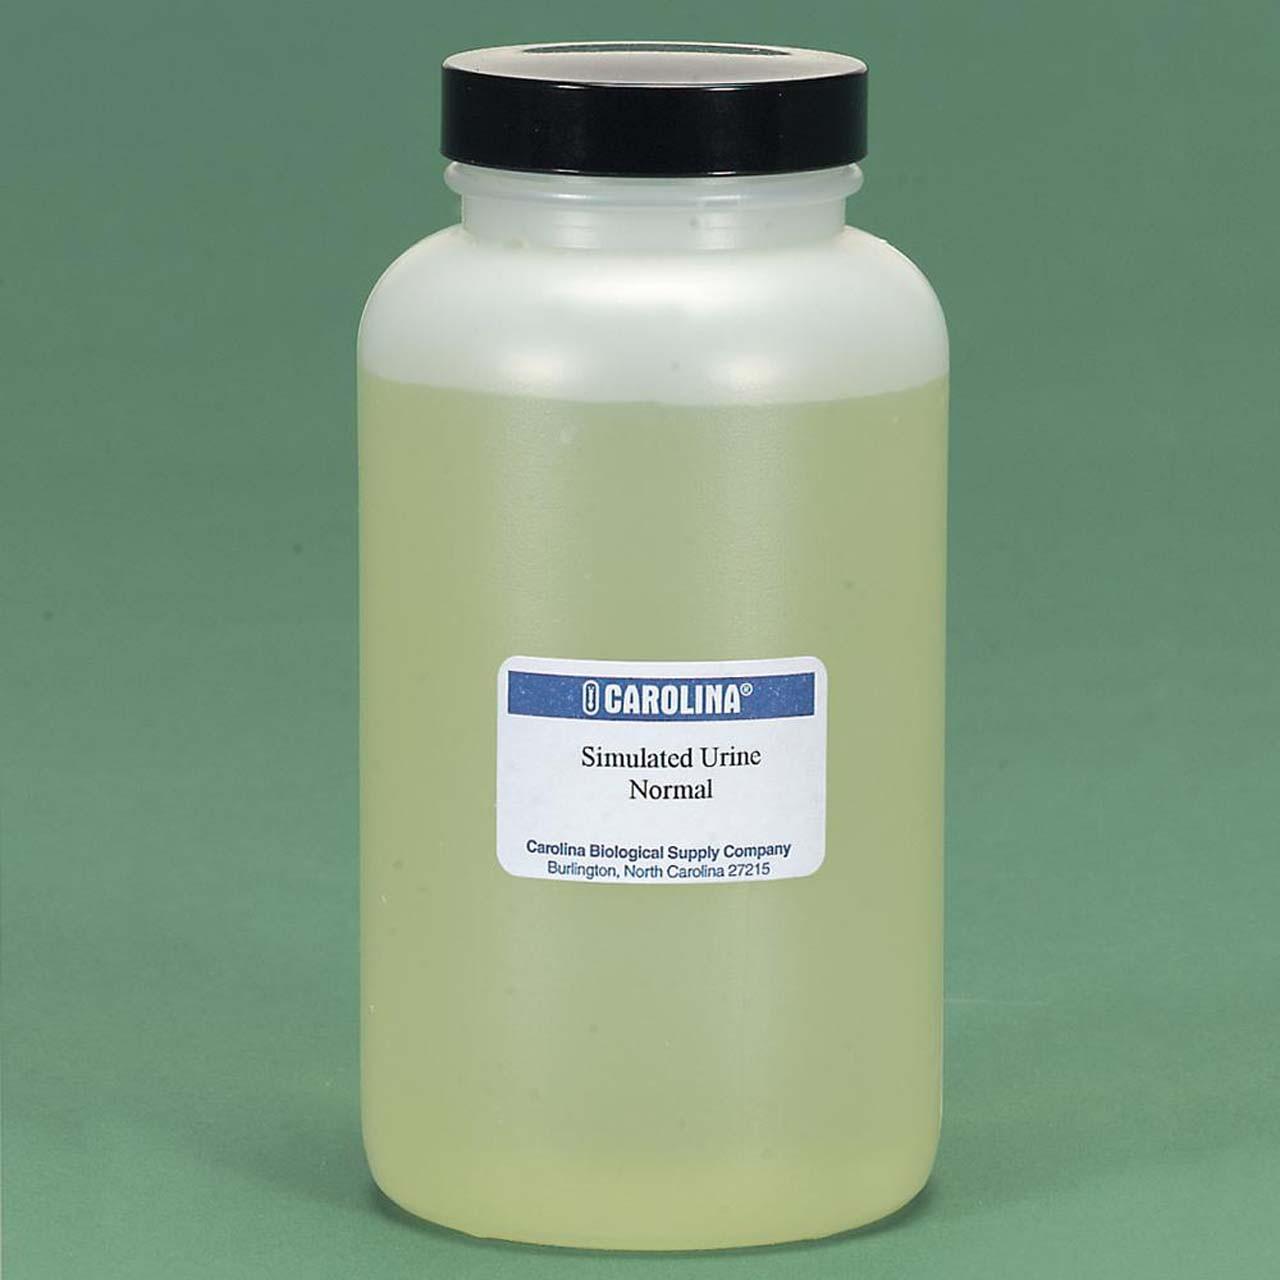 LK3.01 - Simulated urine, Normal